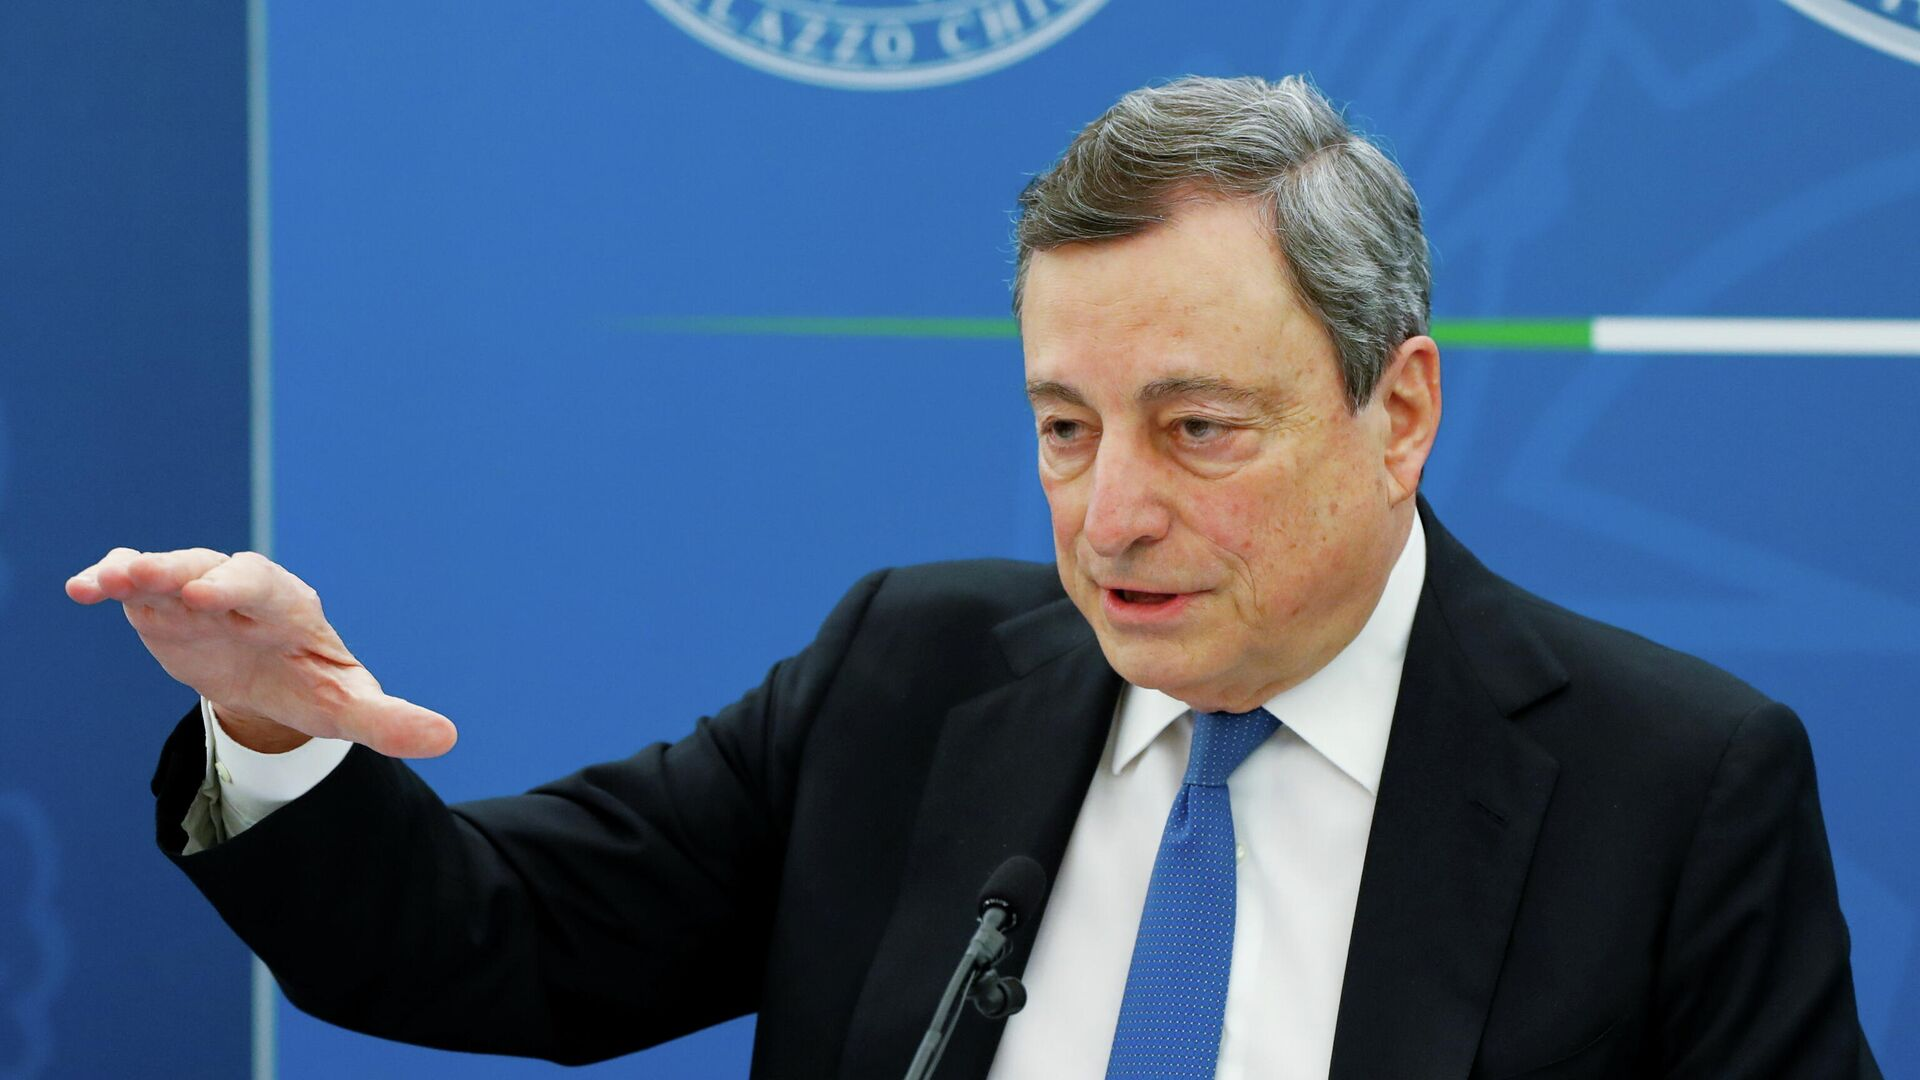 Mario Draghi, primer ministro de Italia - Sputnik Mundo, 1920, 19.04.2021